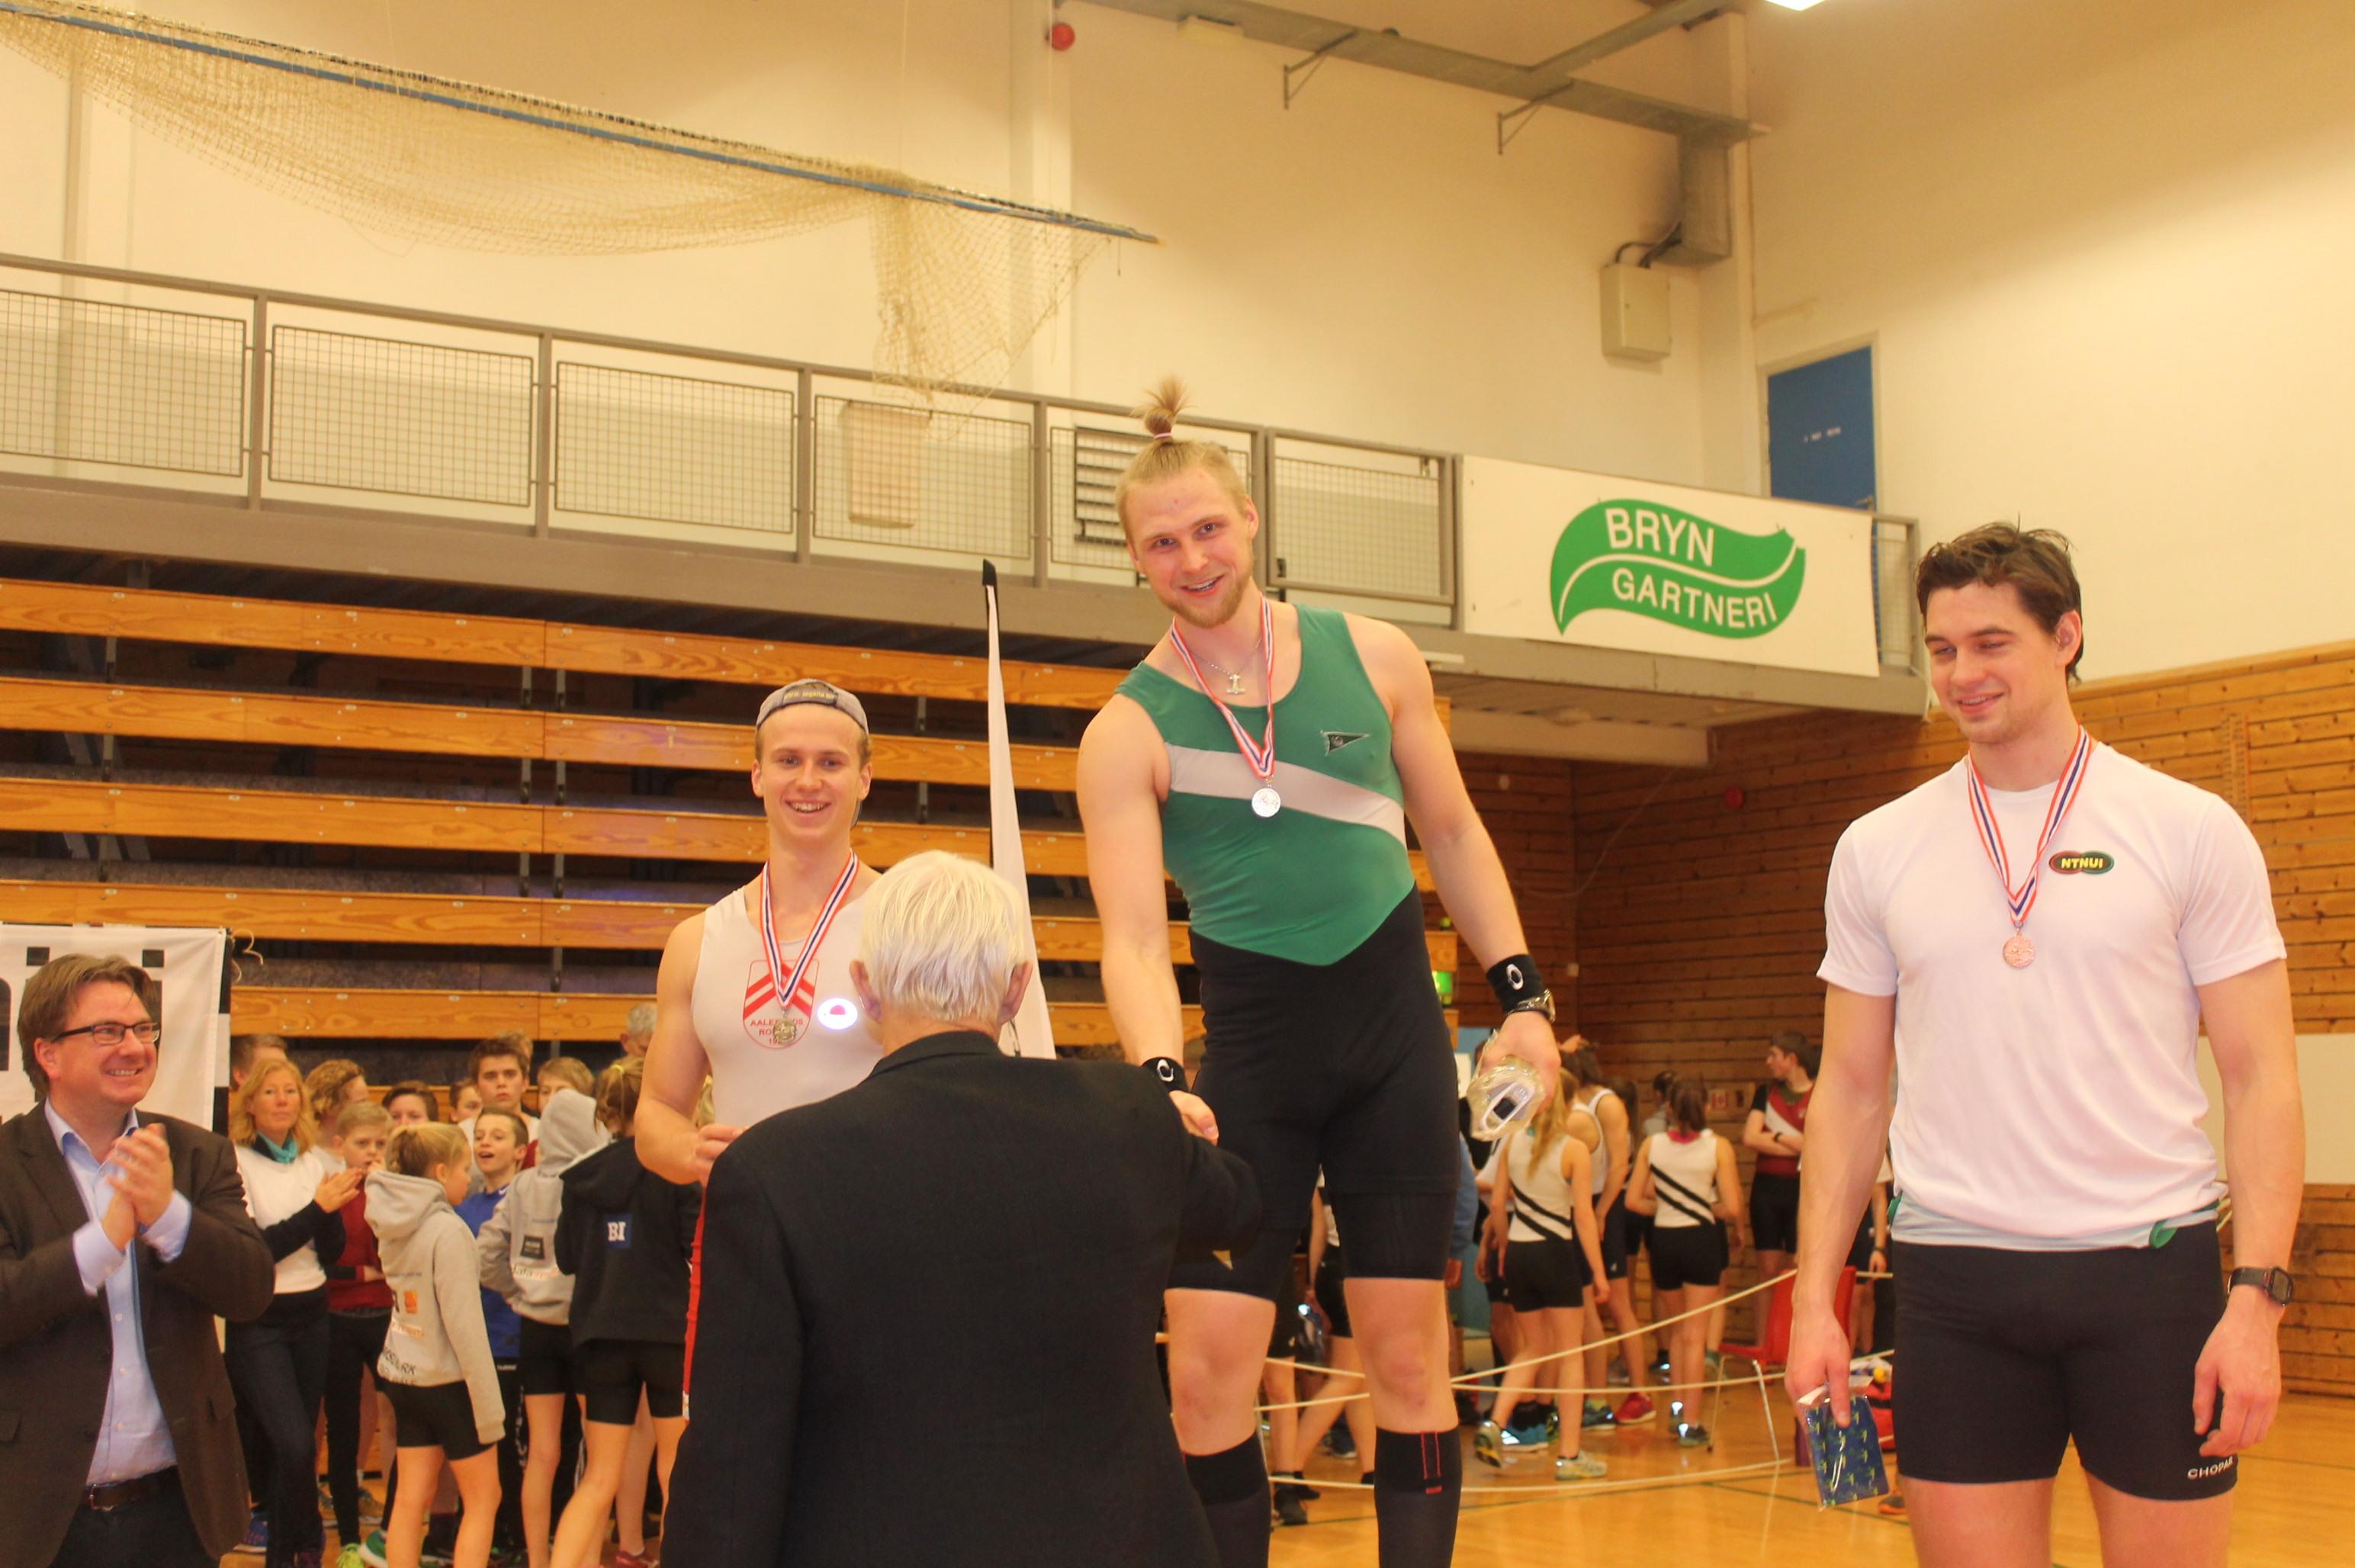 Kris Cato tohn vant seniorklassen.